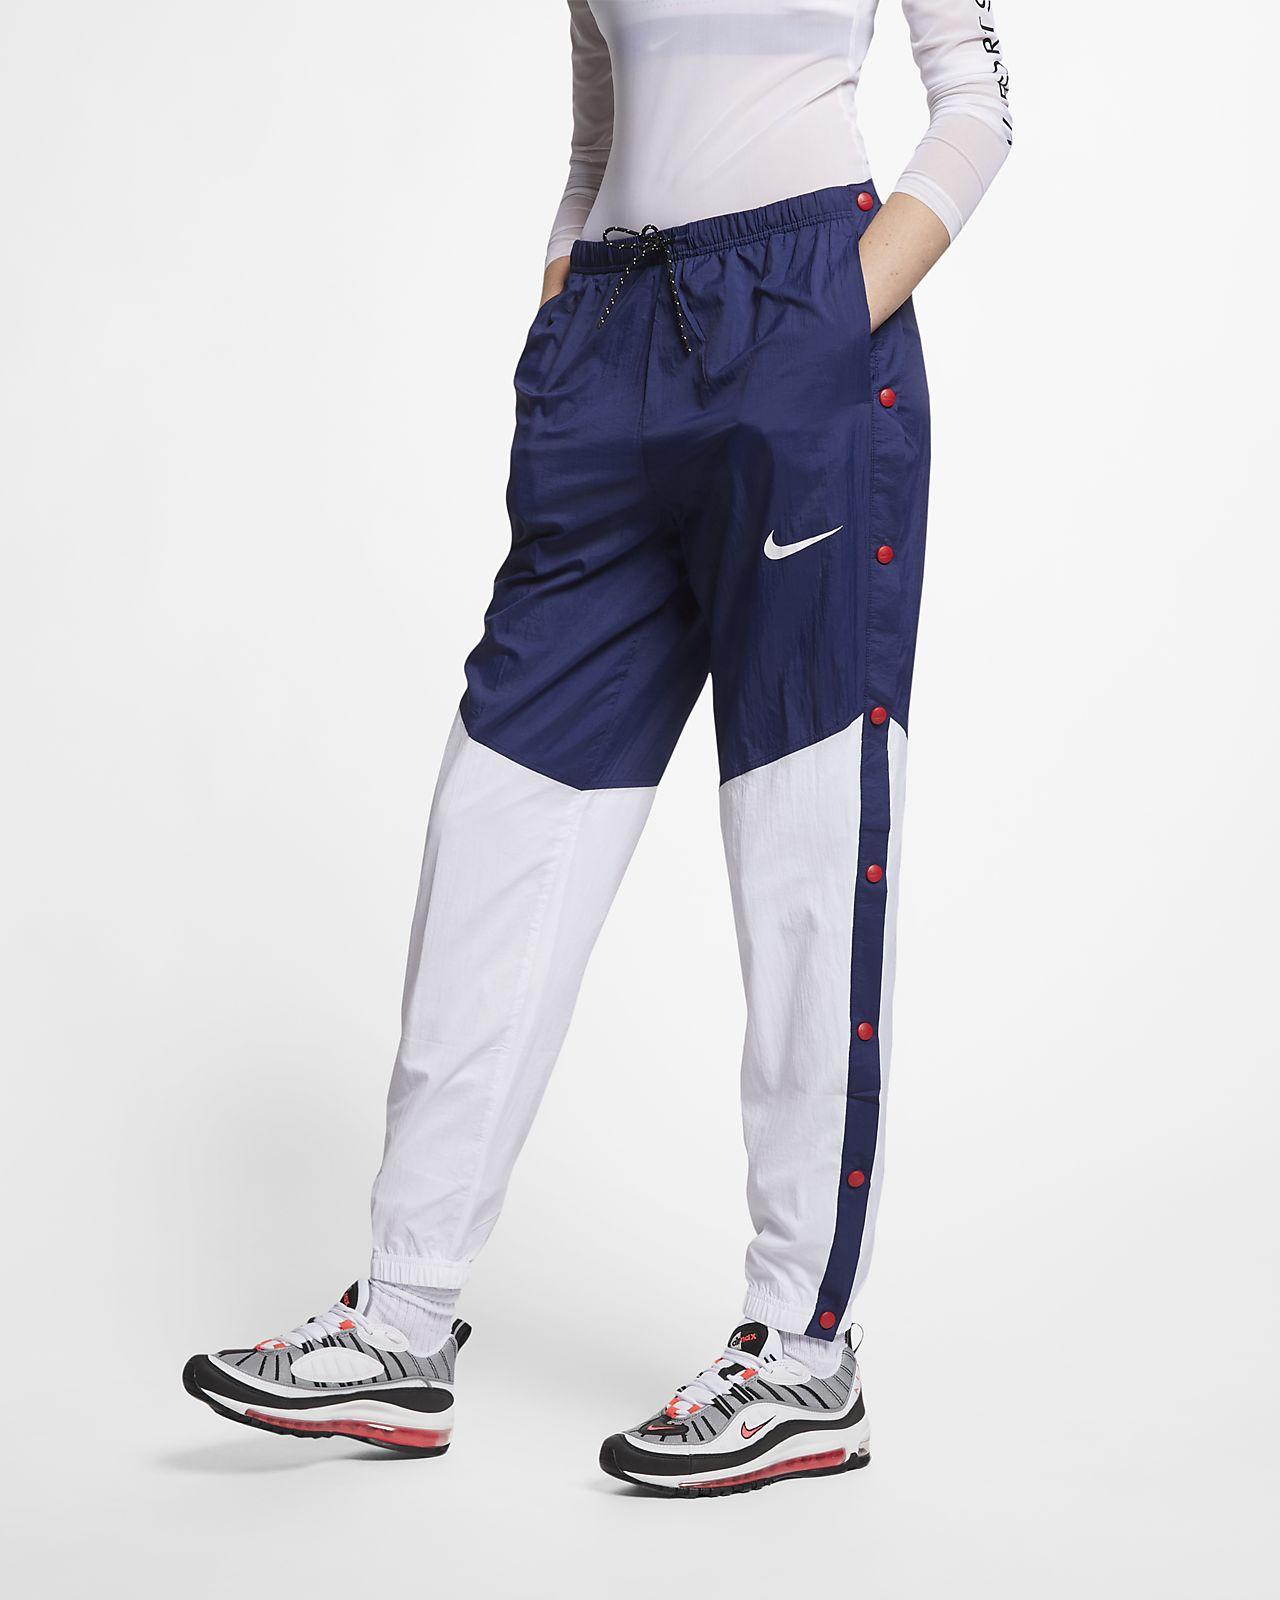 Nike Pantalon Windrunner Sportswear Pantalon Sportswear Ca Windrunner Ca Pantalon Nike Sportswear Nike Ca Windrunner Nike 0S0wTvCq